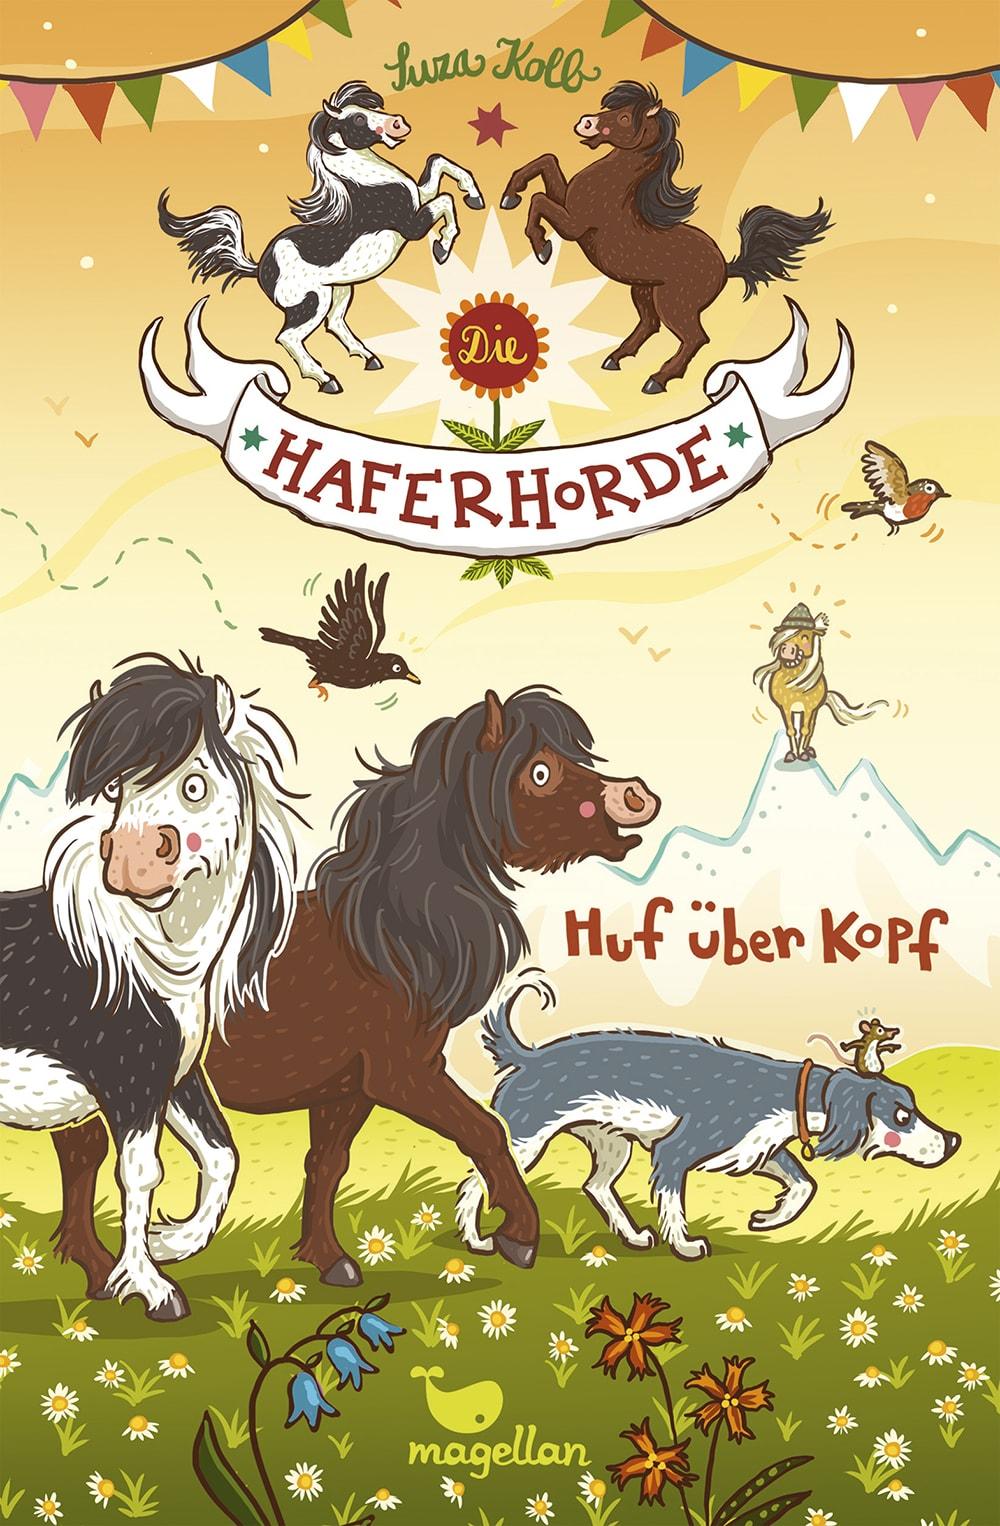 Cover Haferhorde Band7 Huf über Kopf von Suza Kolb